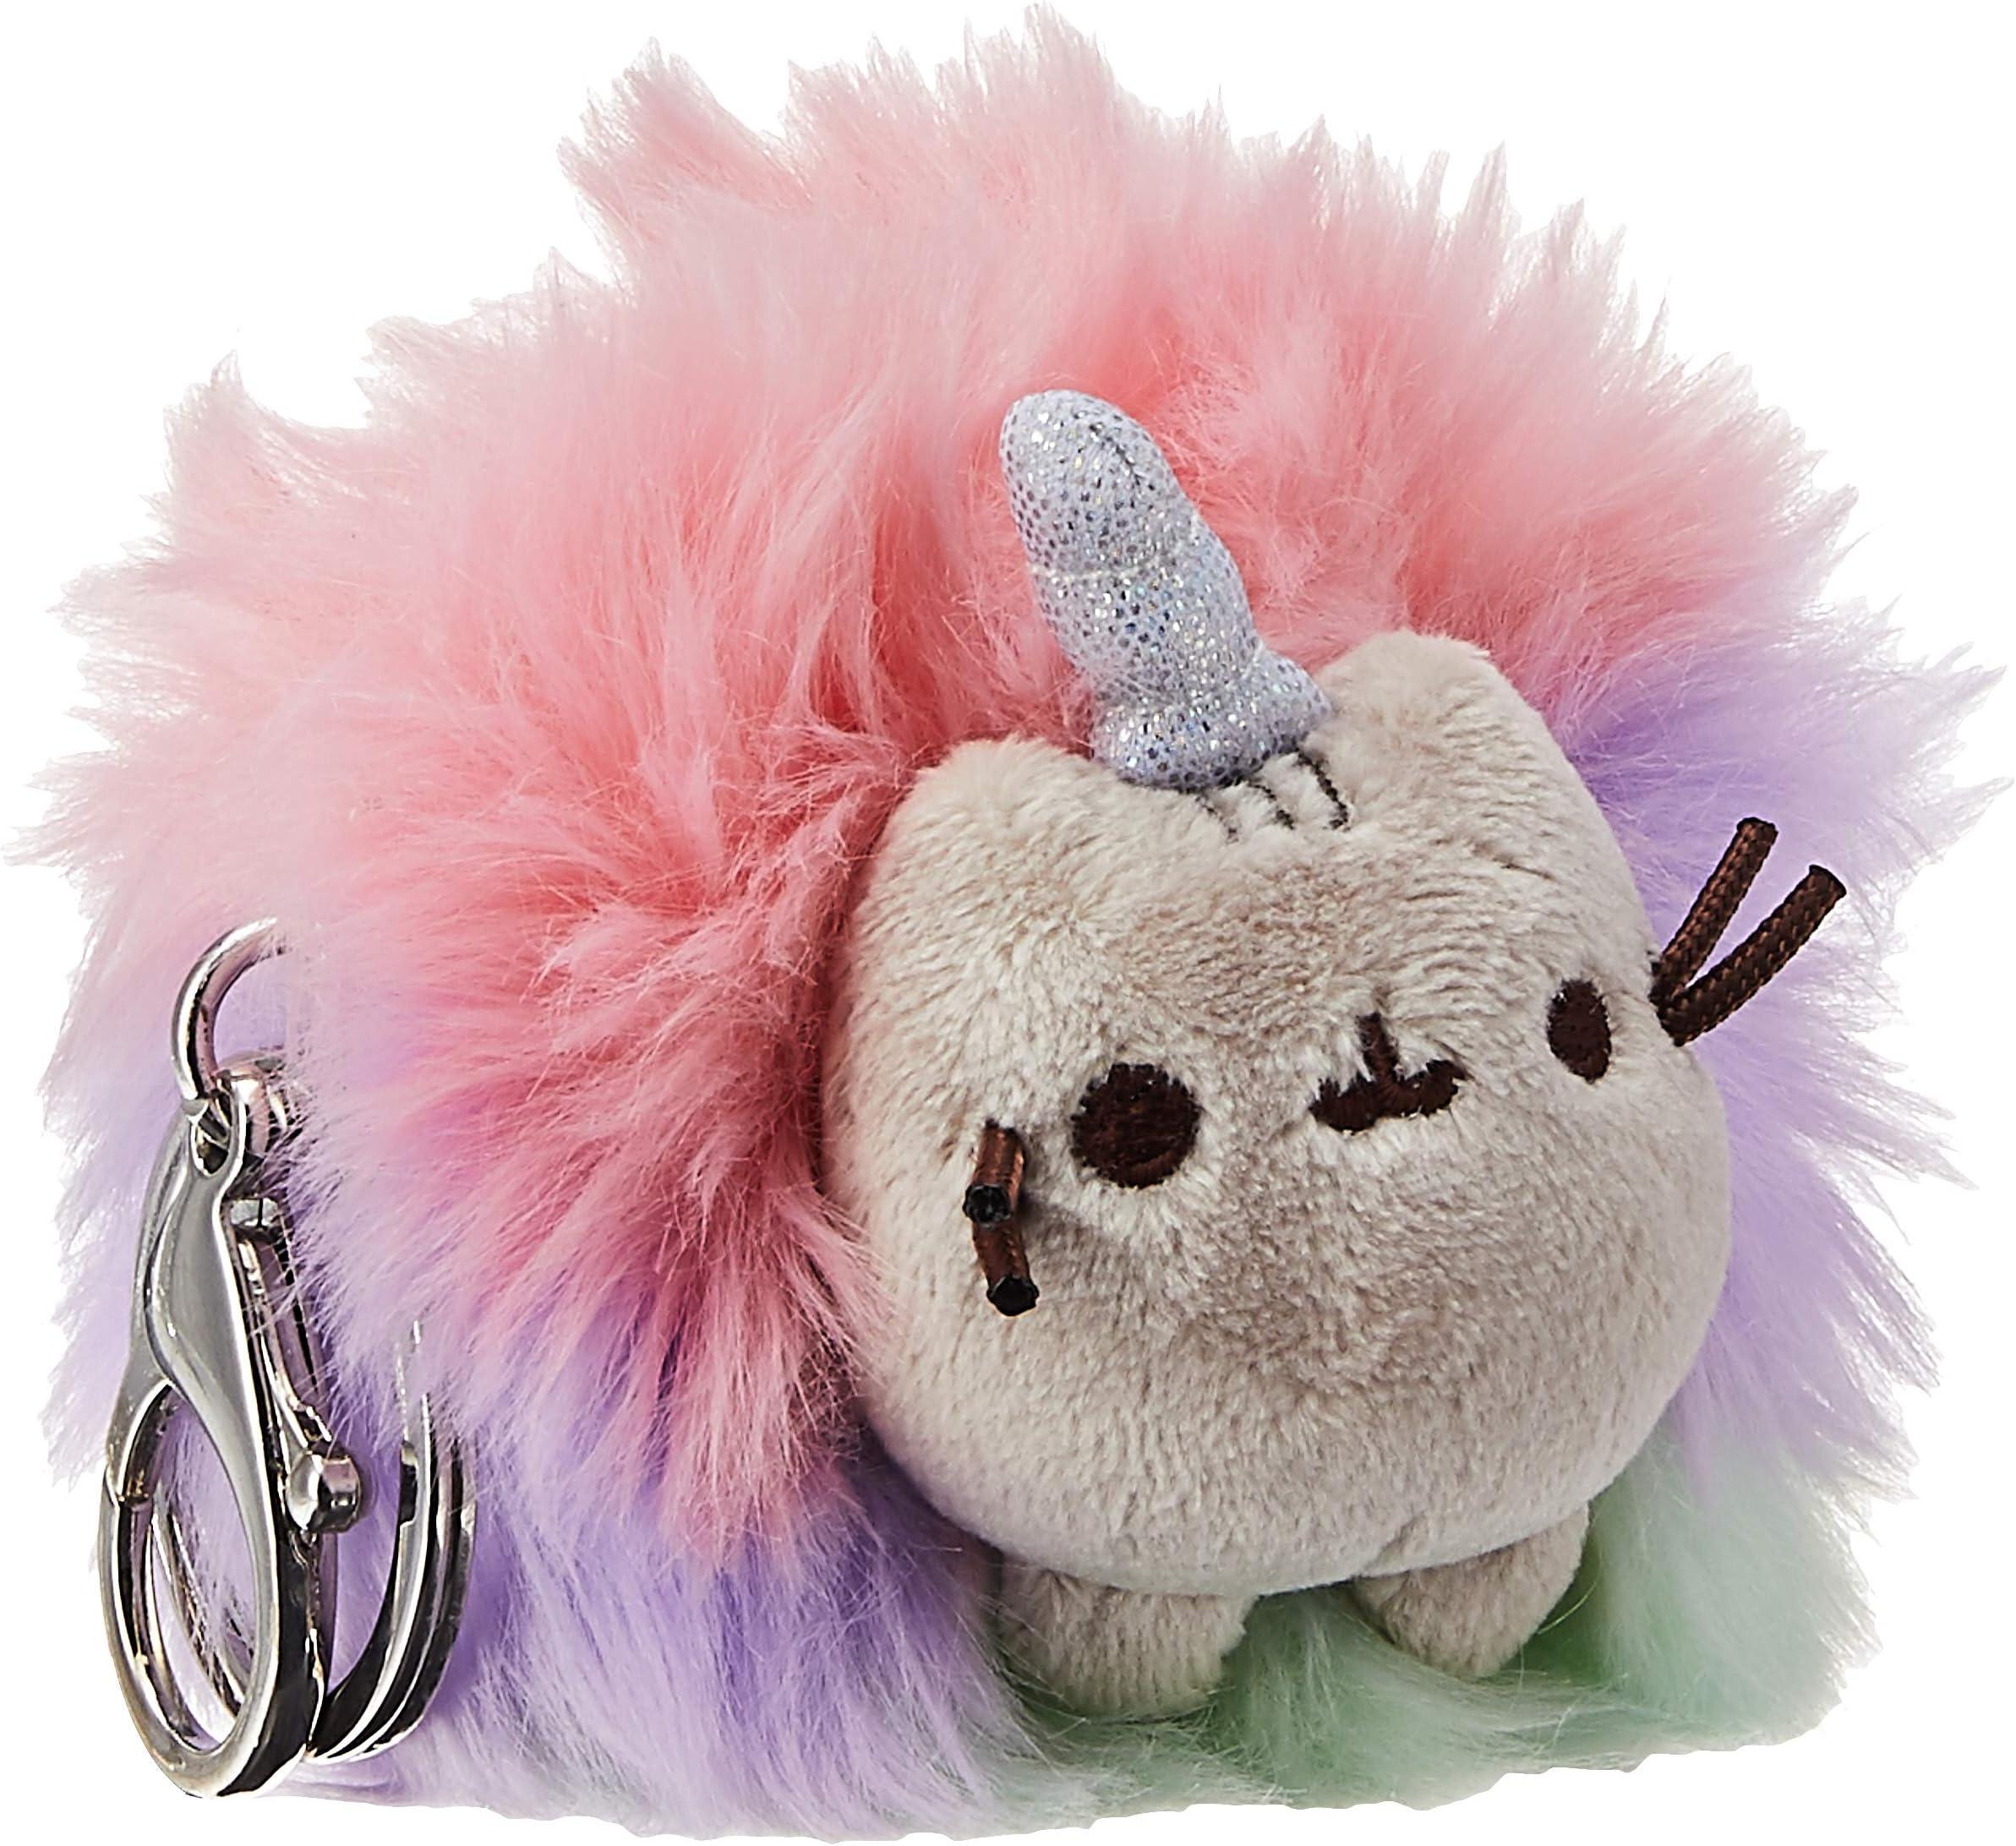 A Moxie Rainbow Blanket Teddy Bear Small Dog or in my case Cat Blanket Doll